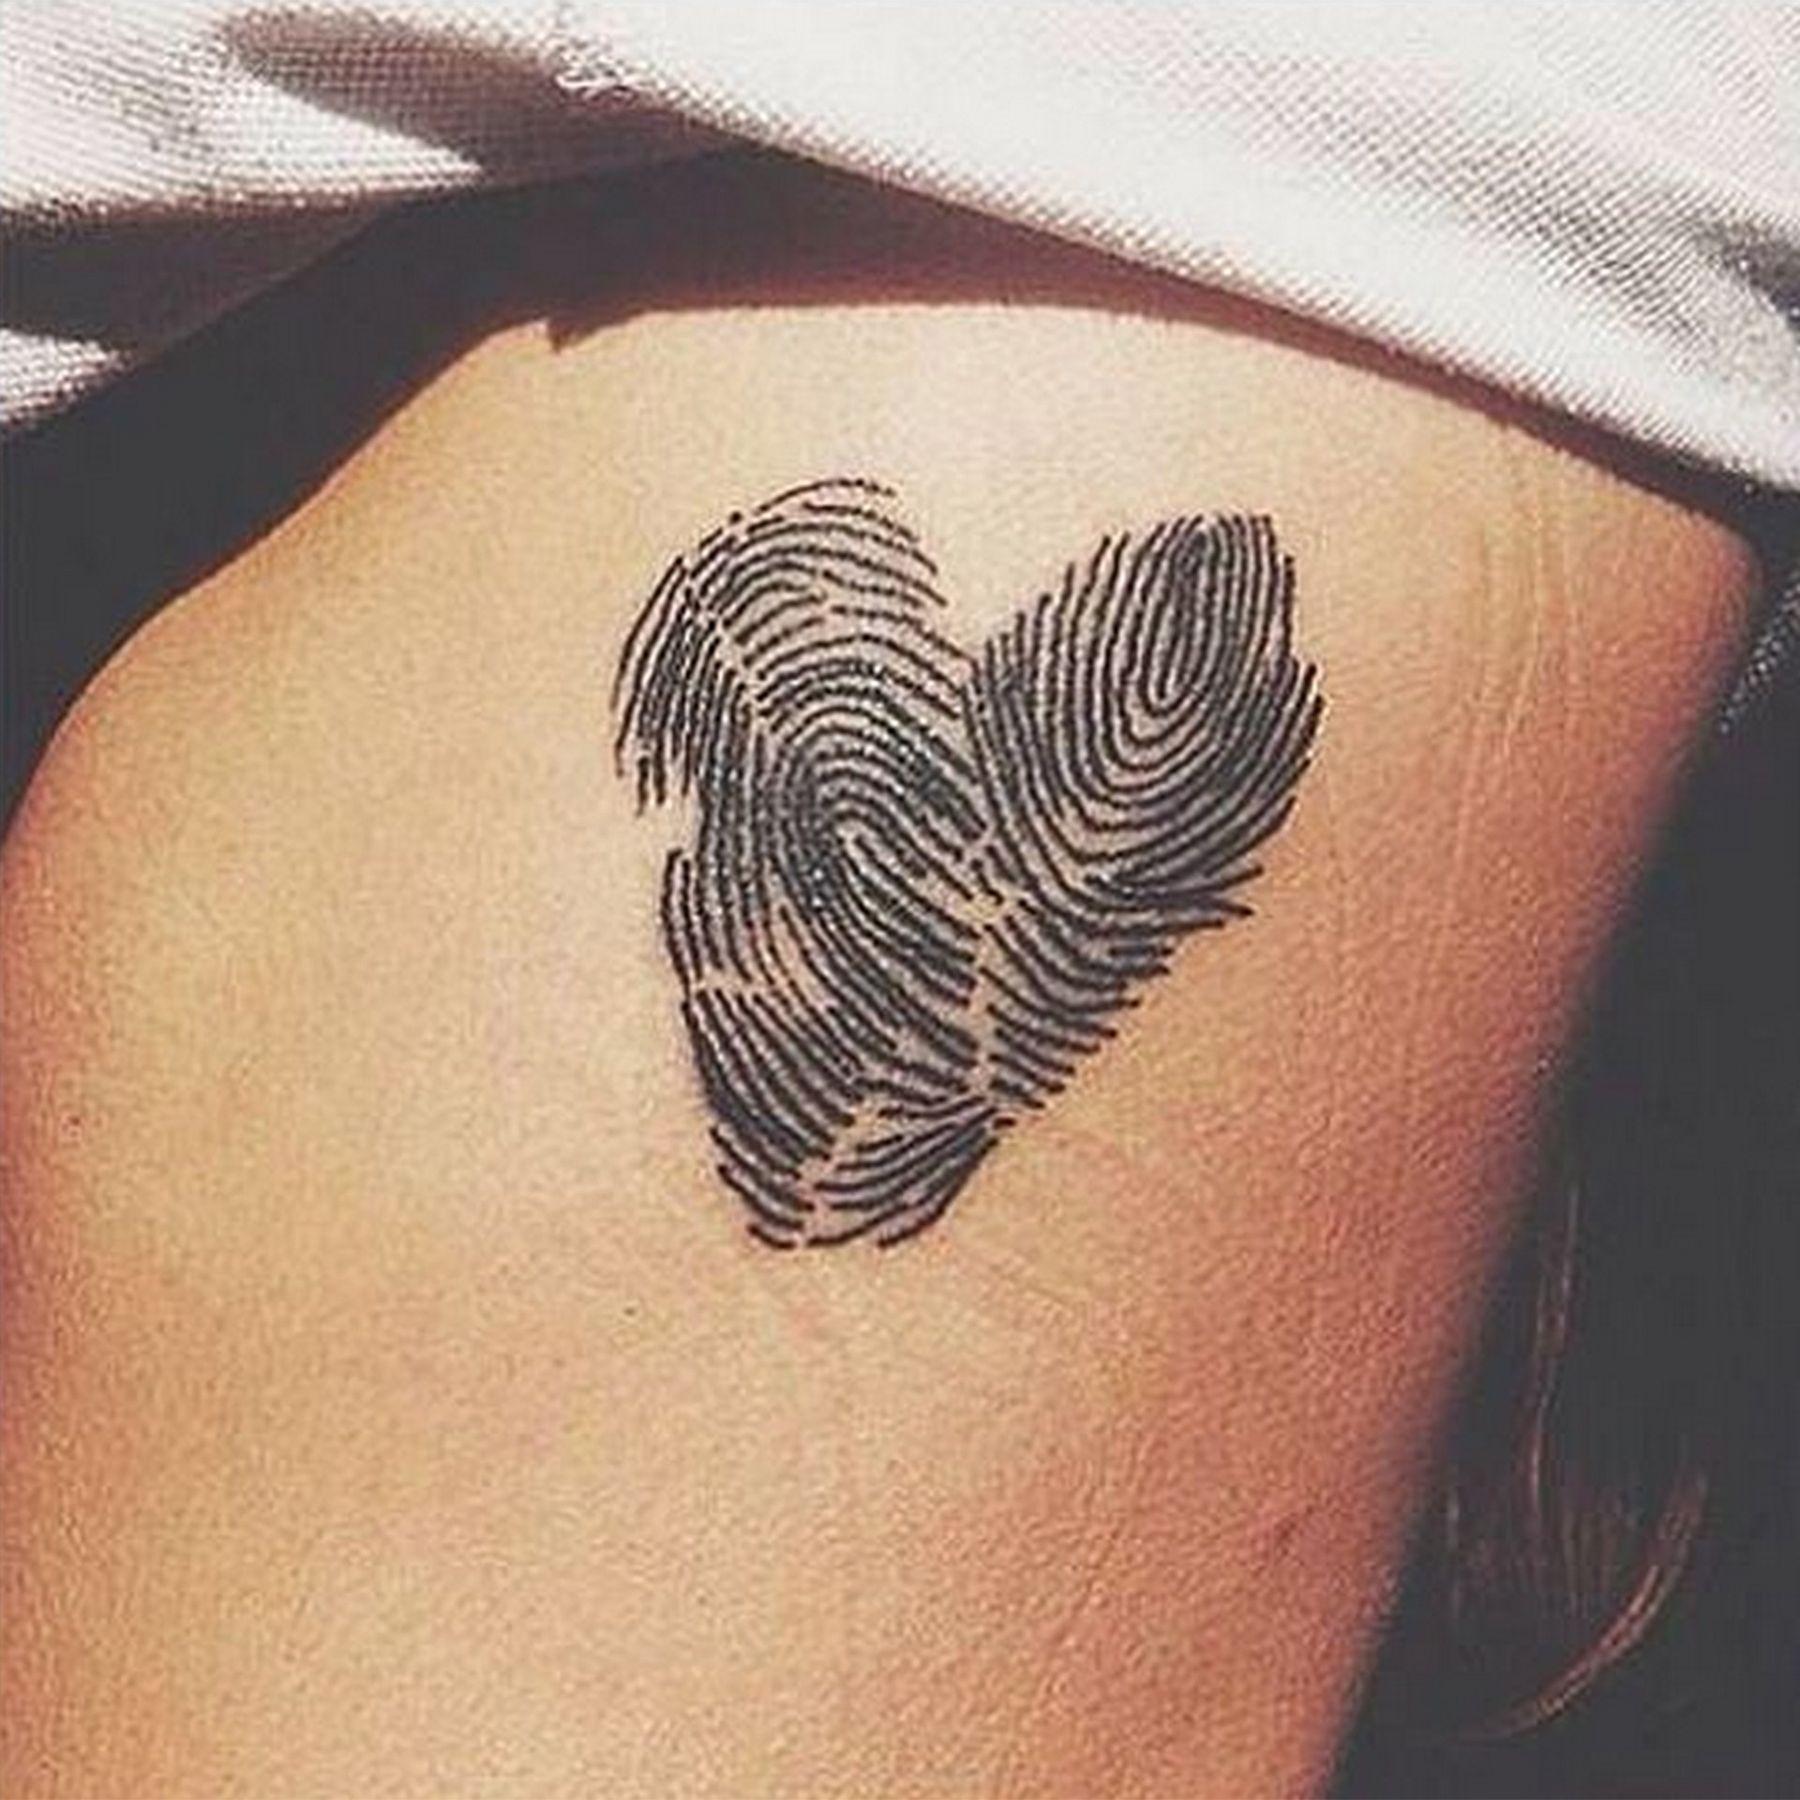 75 cute tattoo ideas: the ultimate instagram inkspiration | small